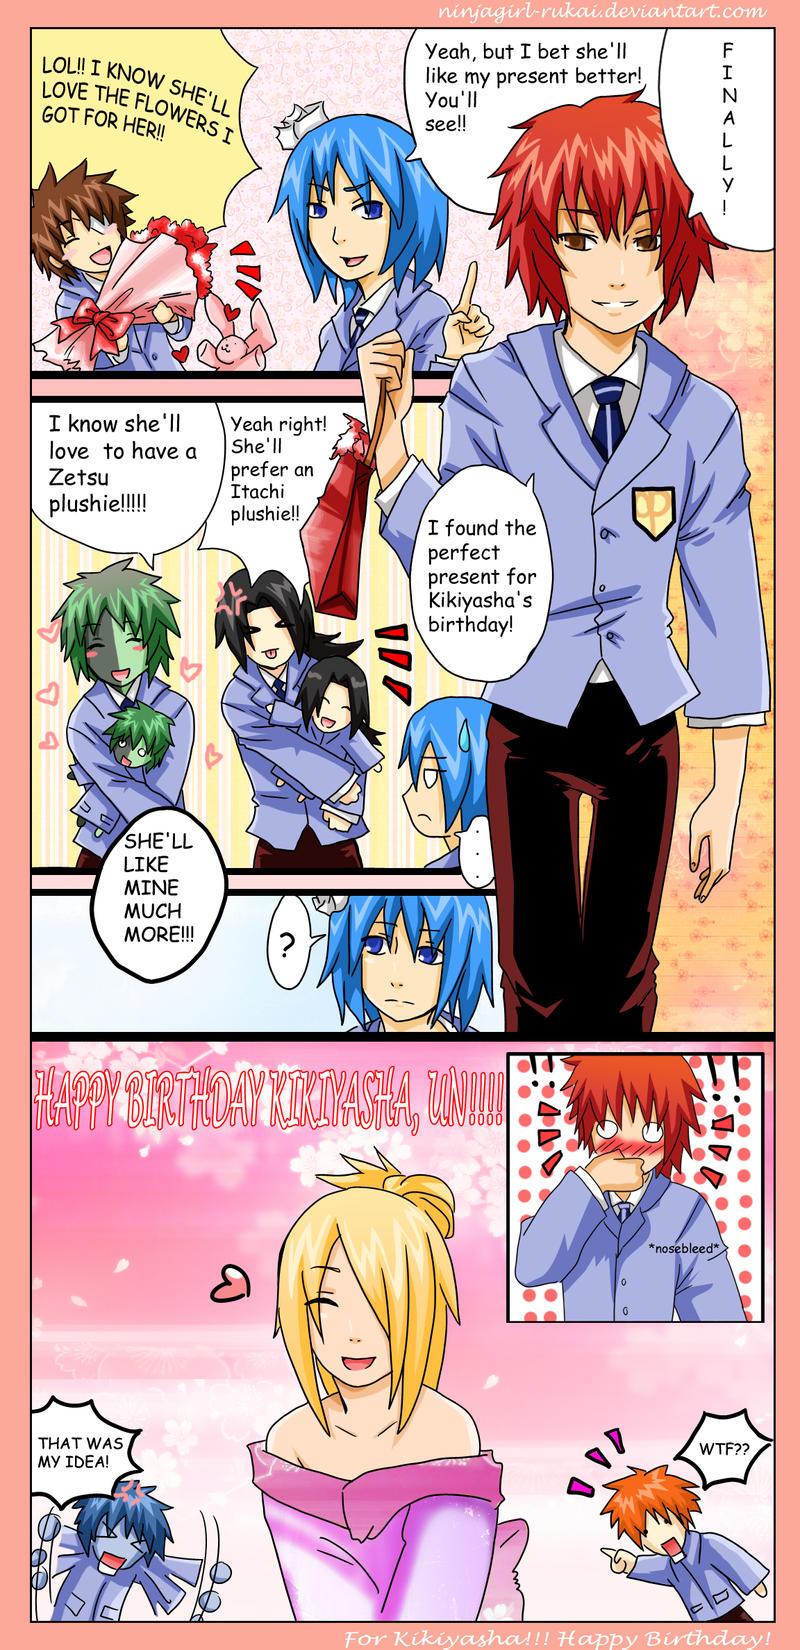 Funny Akatsuki Comics #9